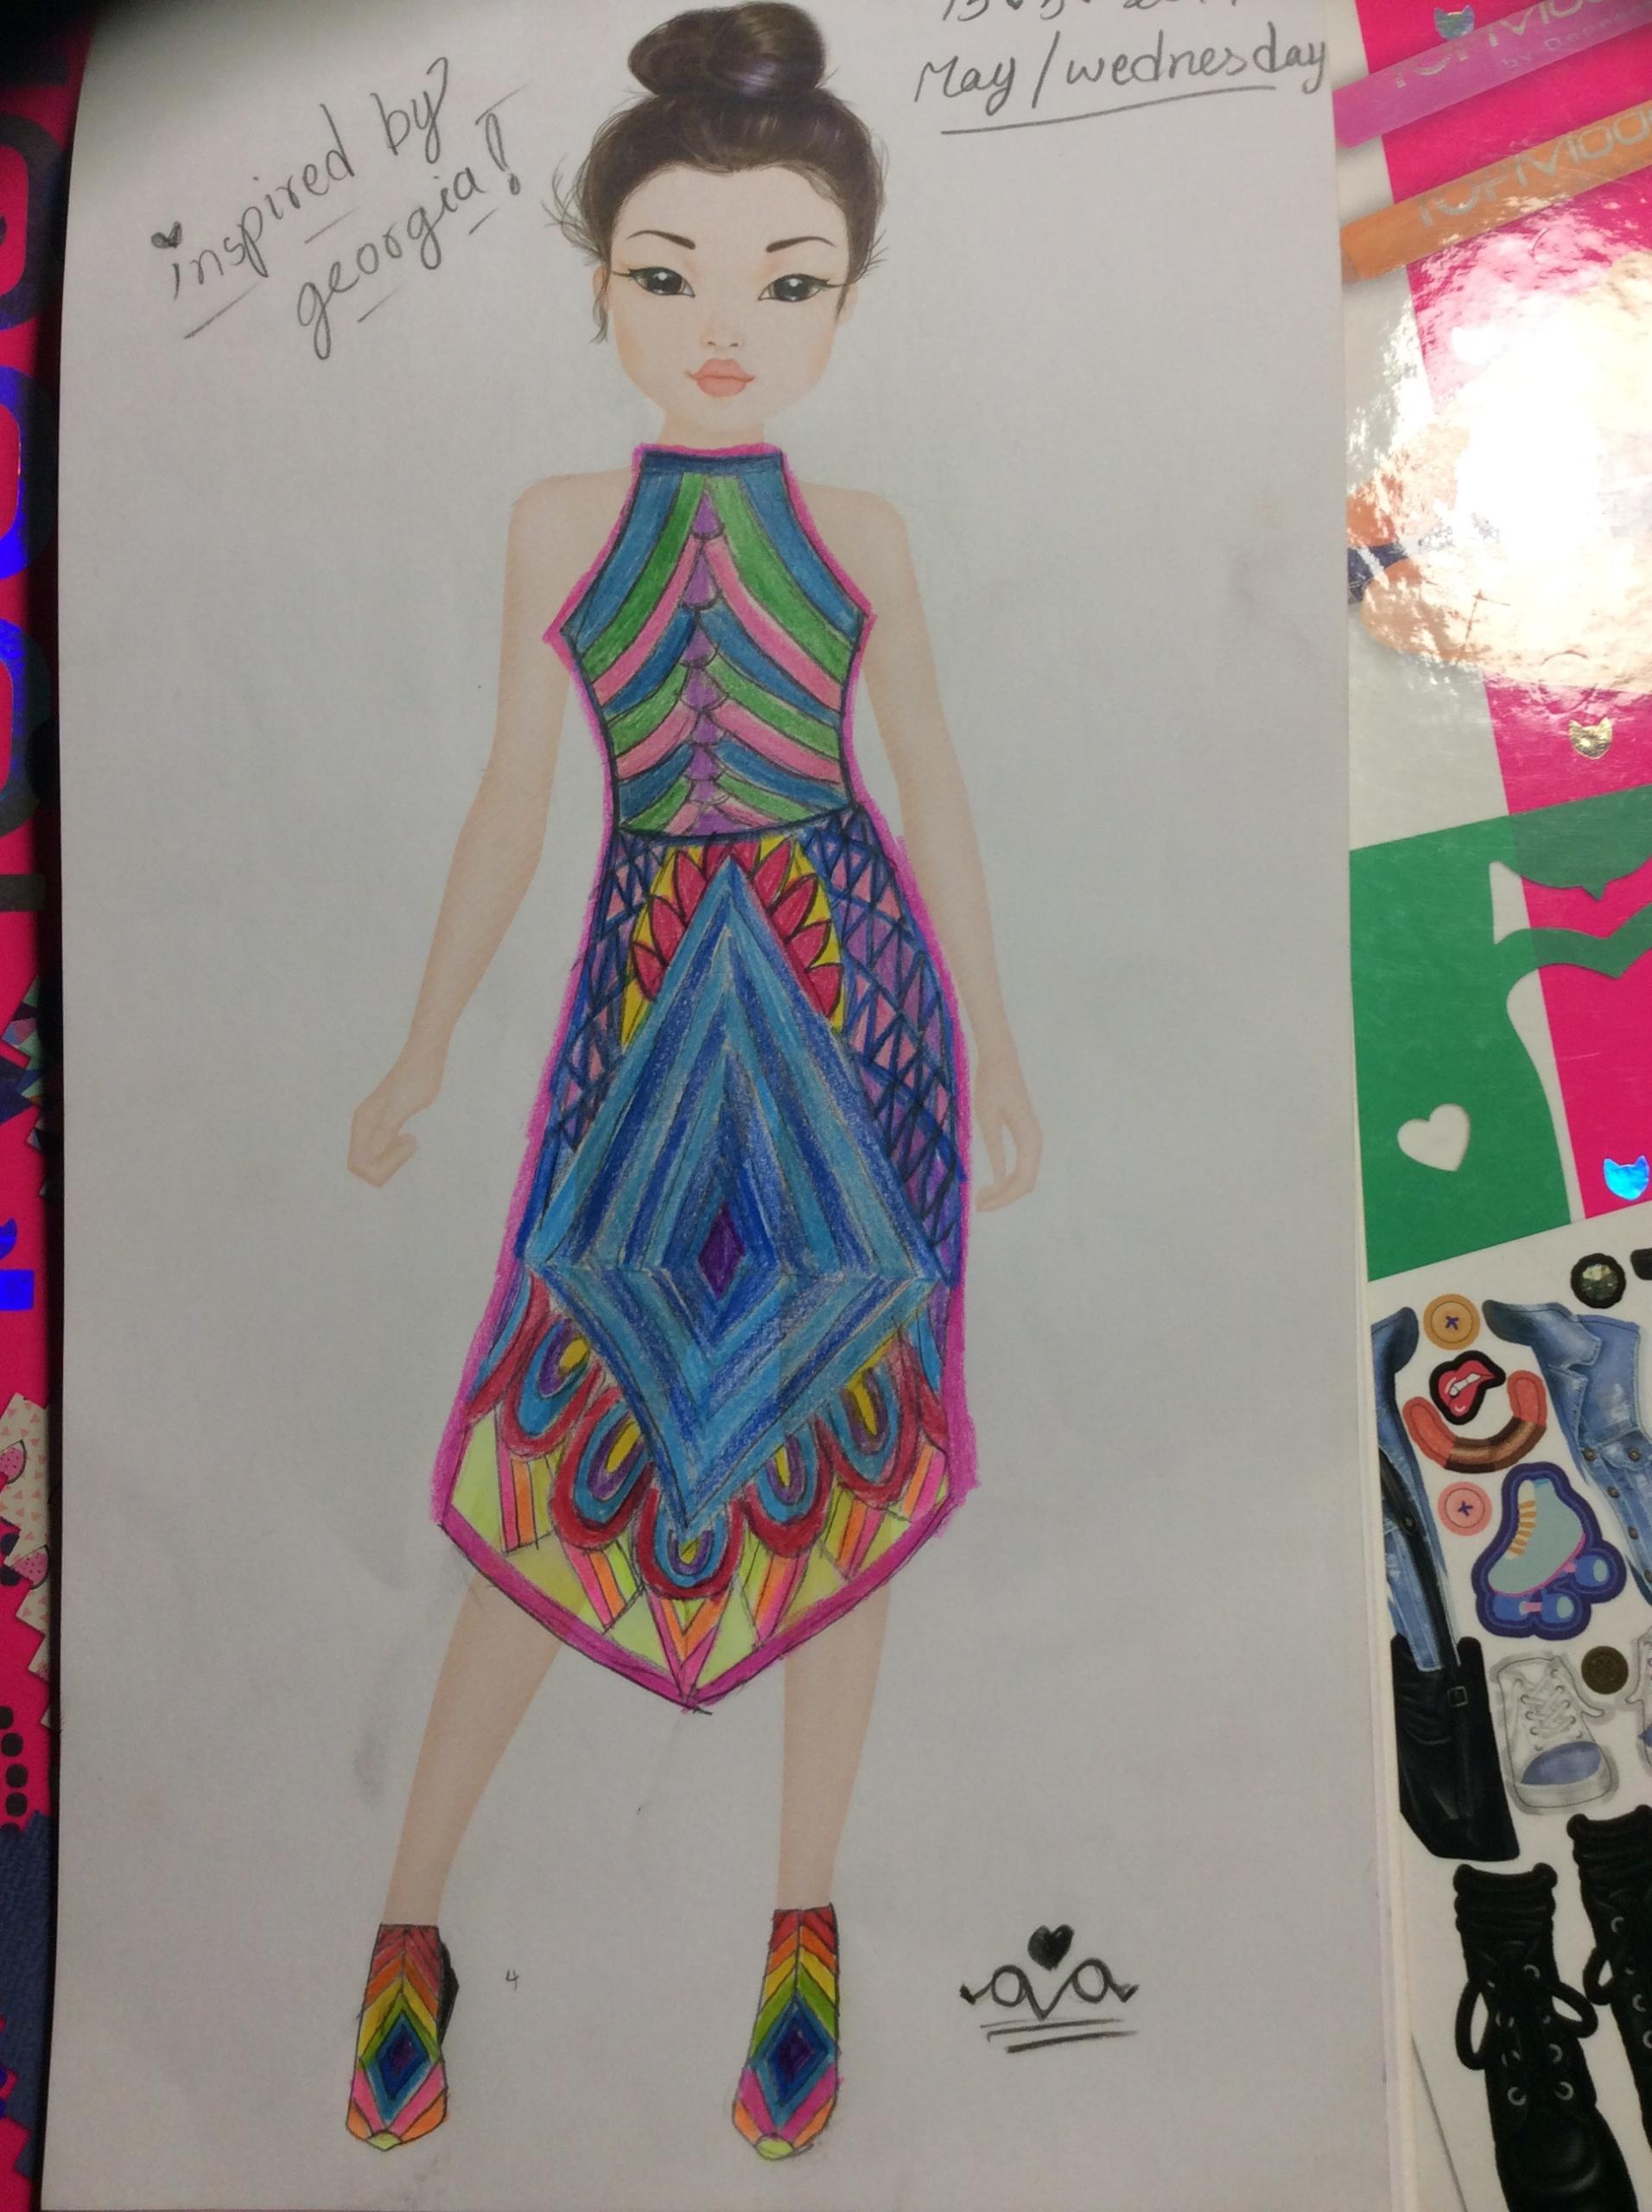 Aathmika  P., 10years, from Shabia, Abu Dhabi